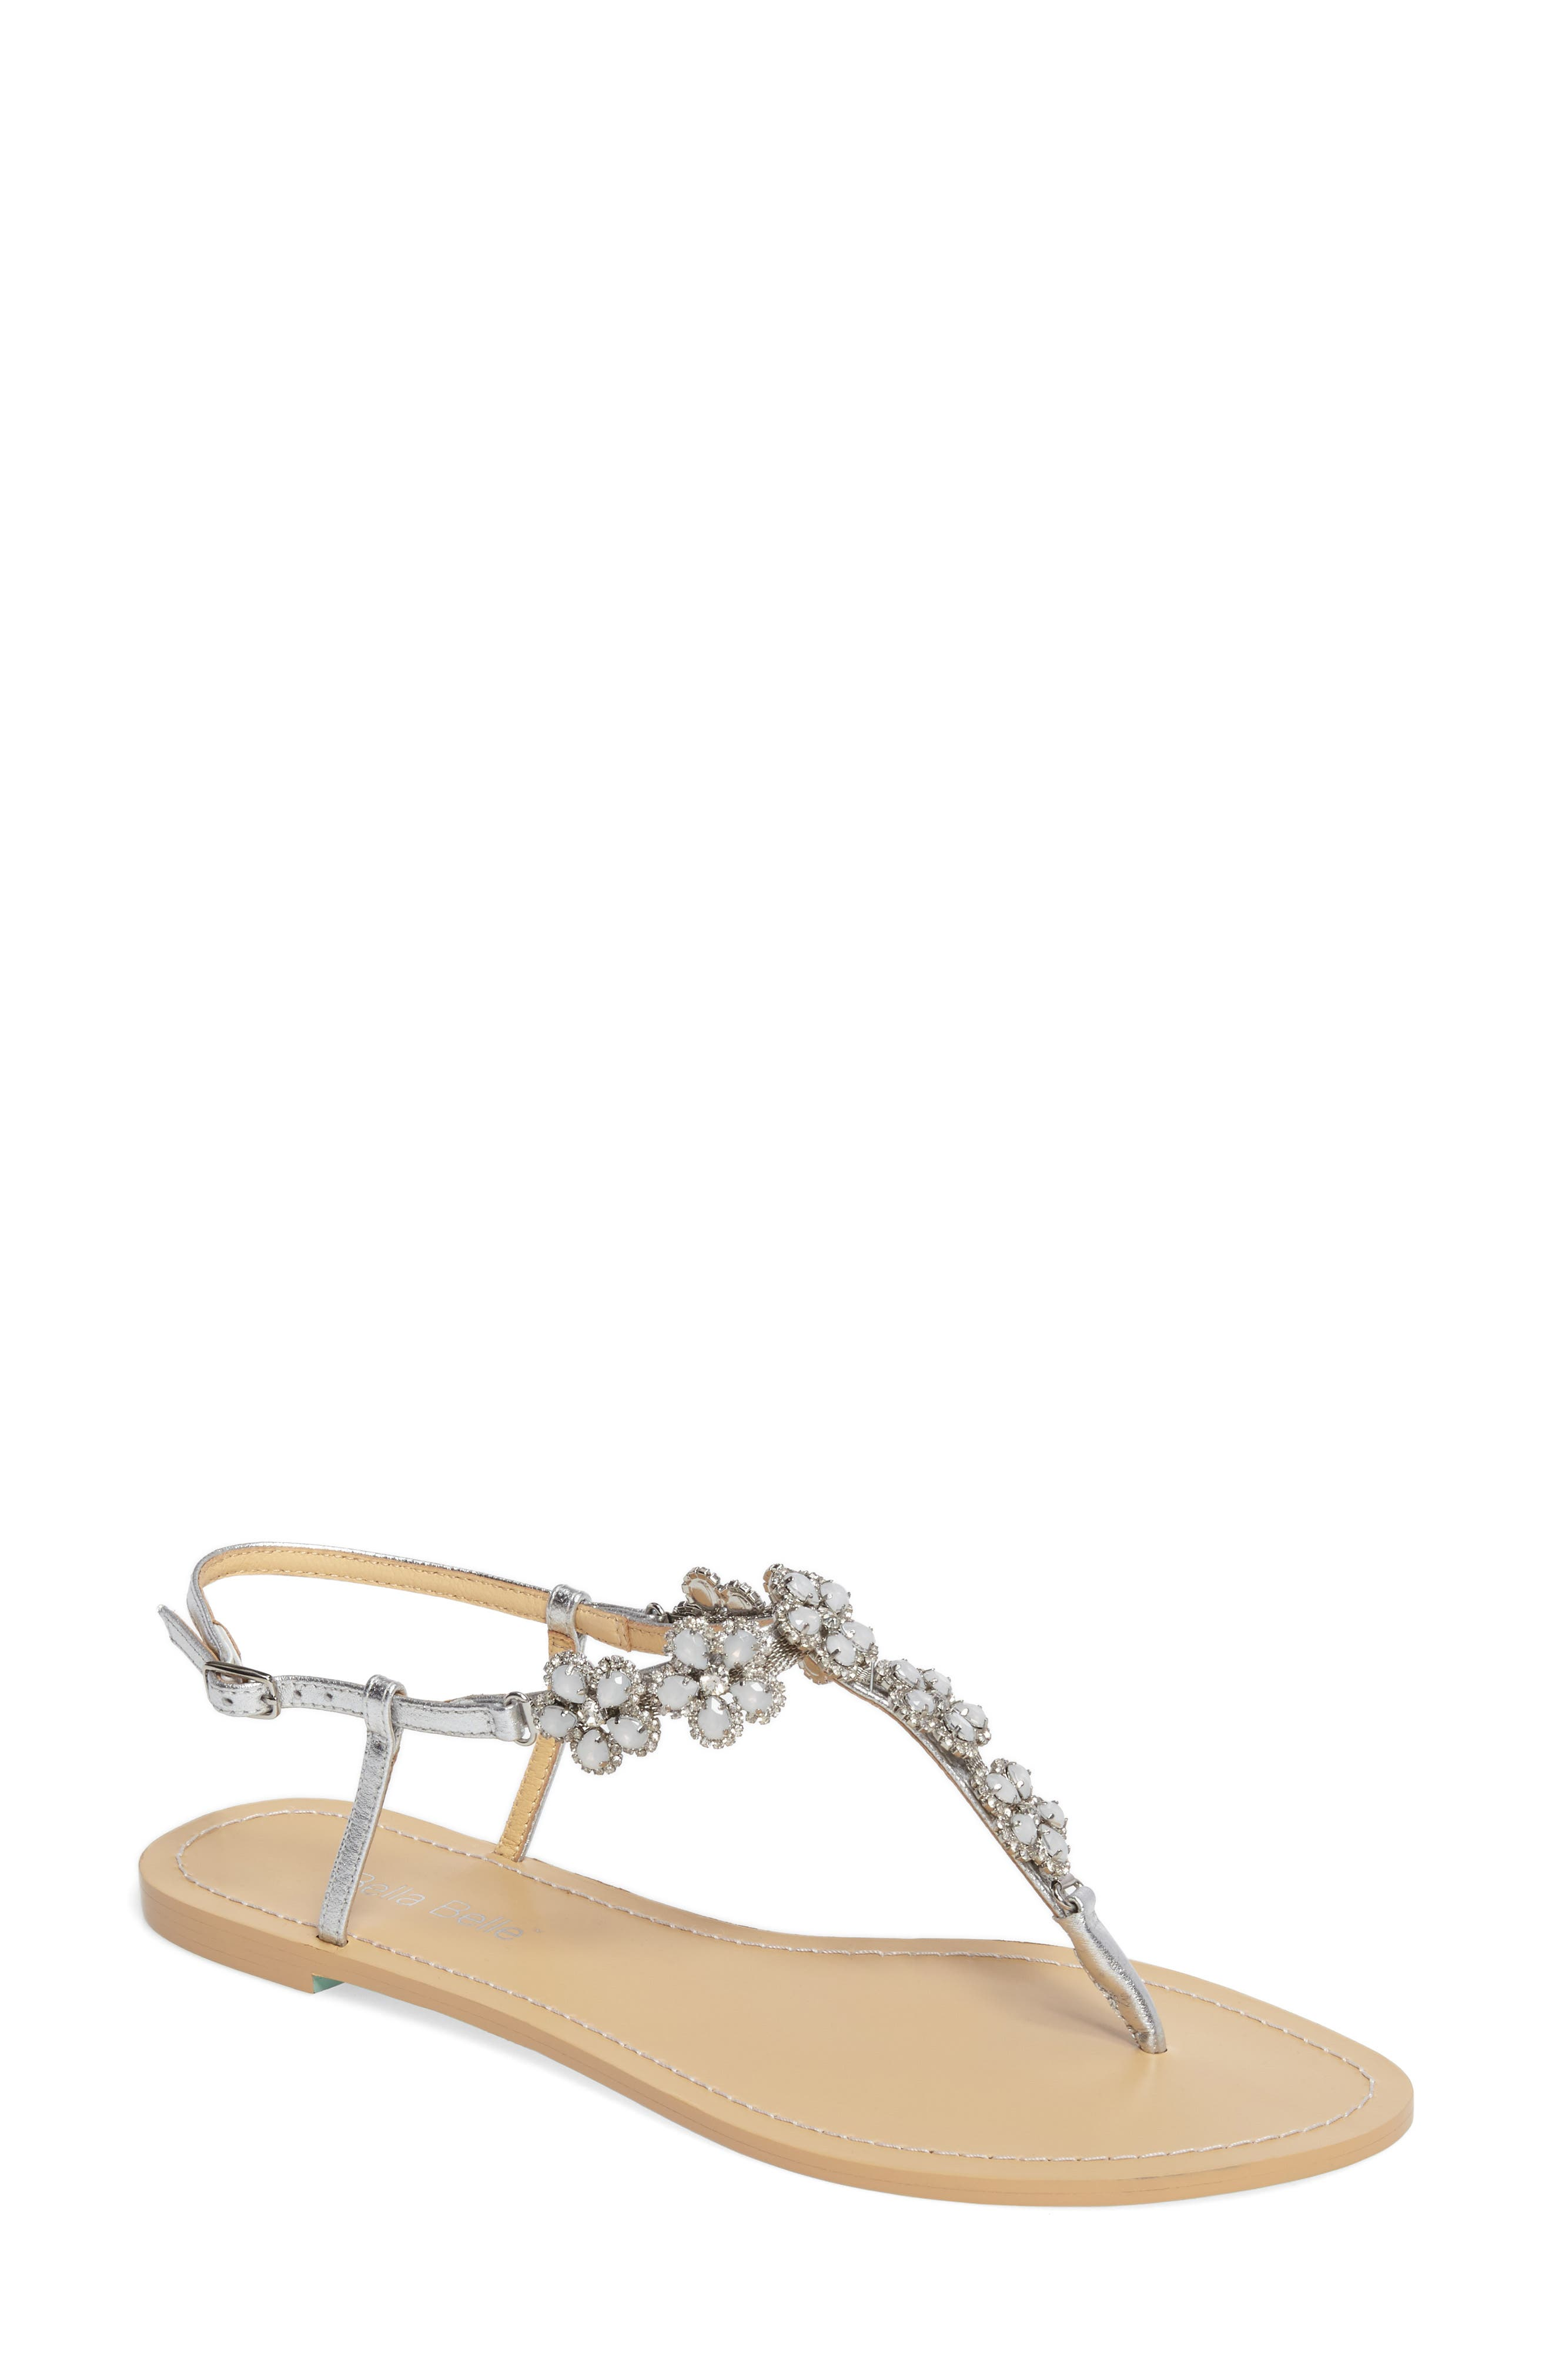 Rhea Sandal,                         Main,                         color, Silver Leather